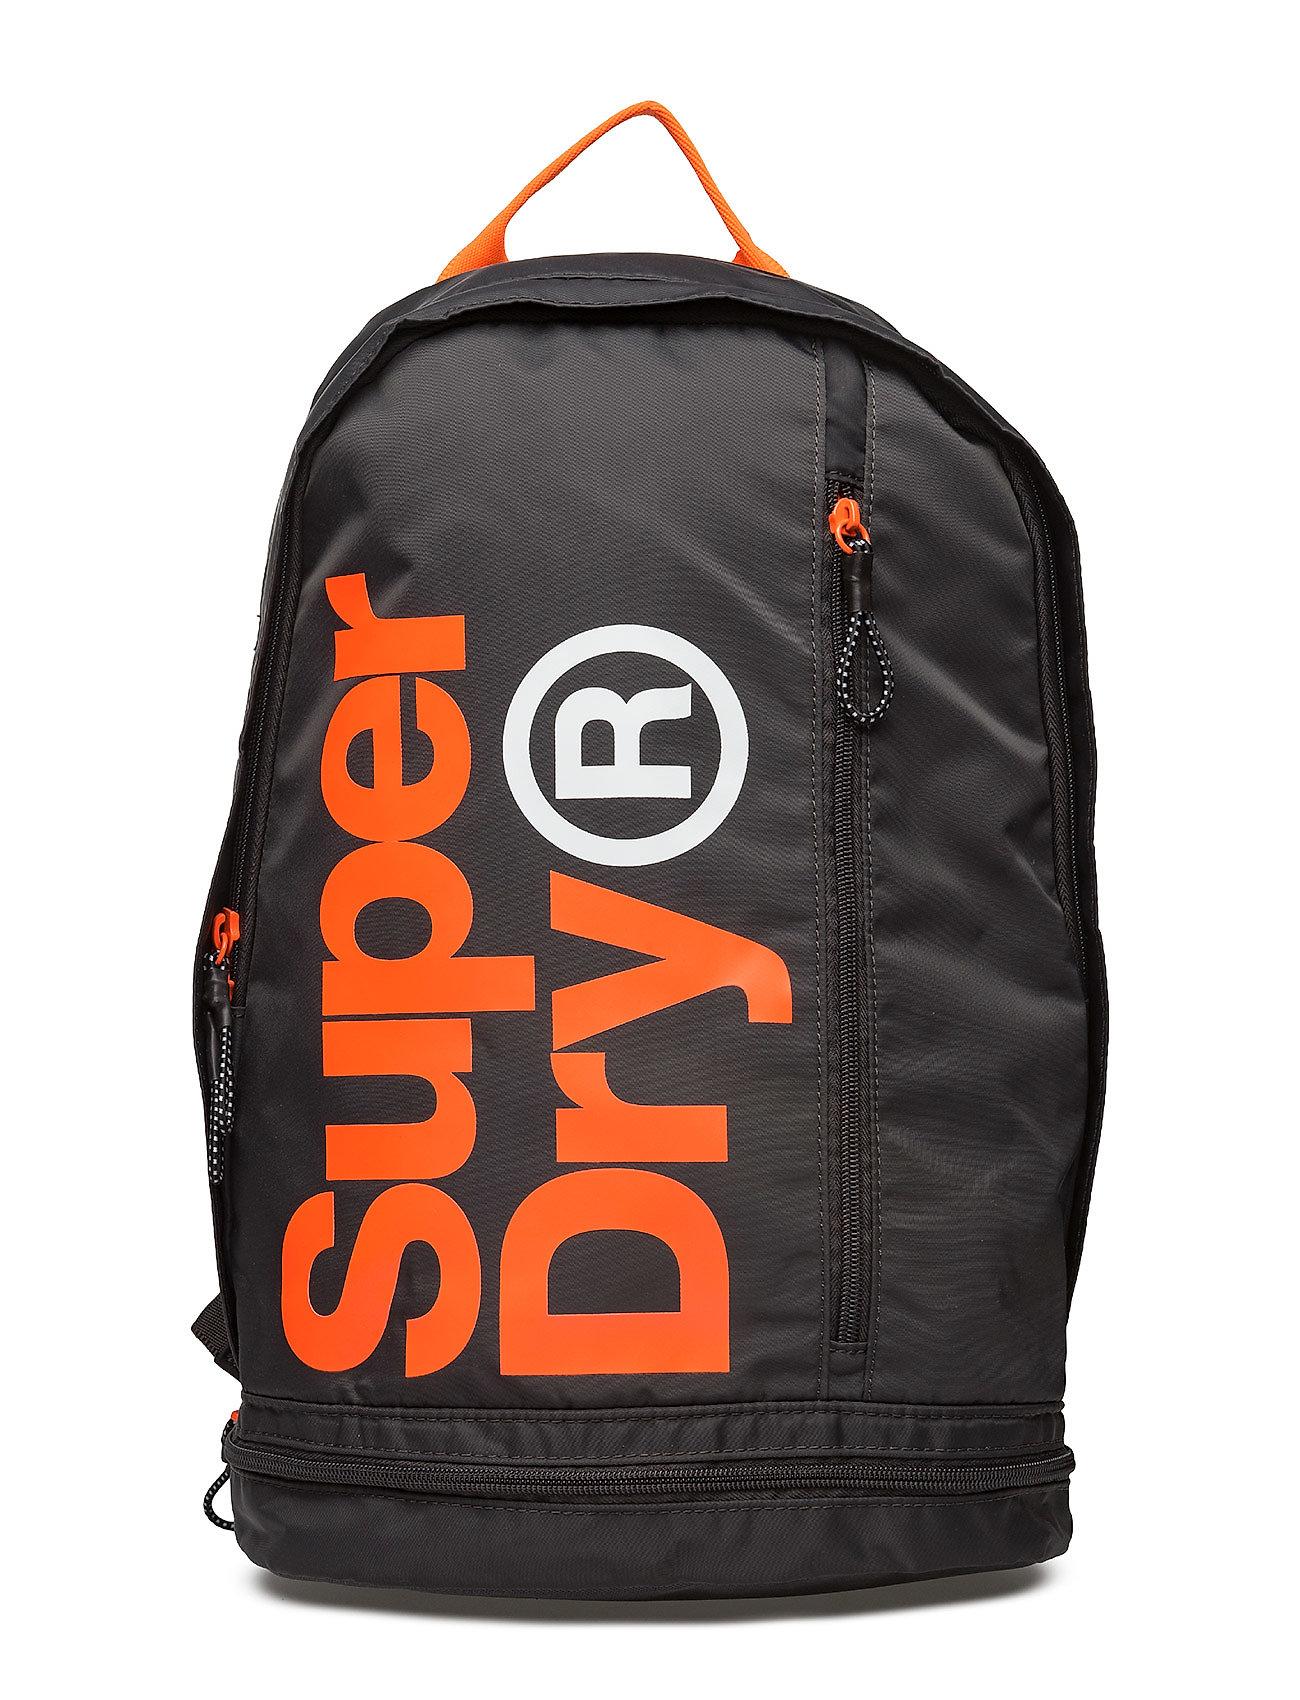 Superdry Freshmanbackpack, Men's Backpack